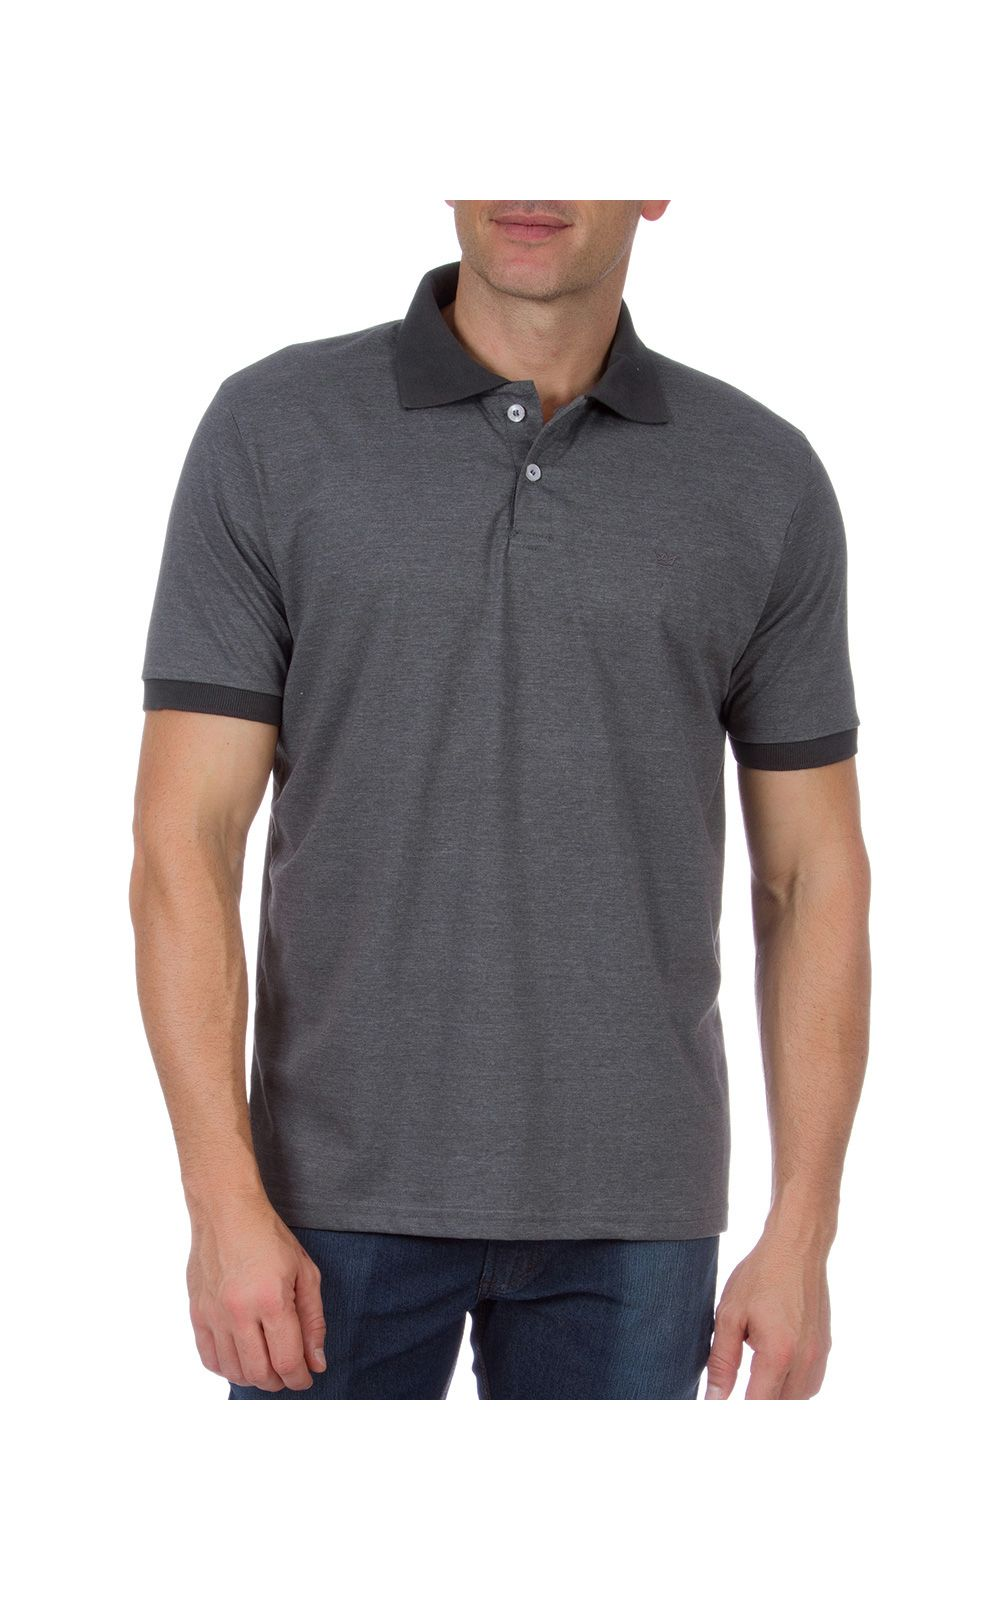 efc8e65e5a Camisa Polo Masculina Cinza Lisa